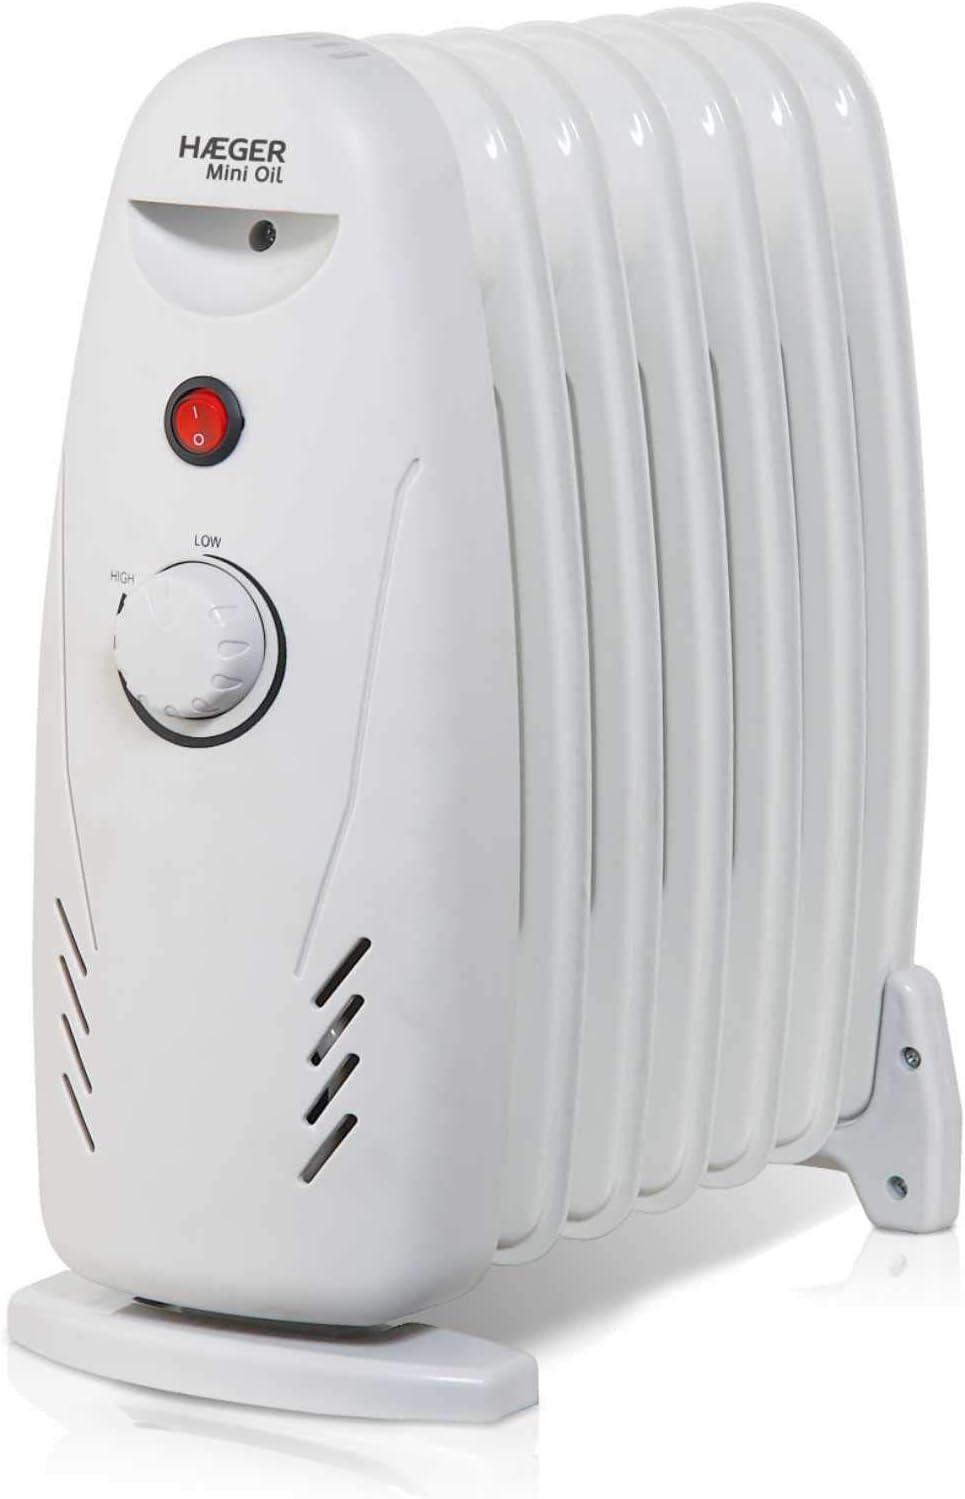 HAEGER Mini Oil - Radiador eléctrico de Aceite (7 Finos) de 600 W, con 7 Elementos (125 x 320mm), botón de Encendido/Apagado y termostato Regulable.